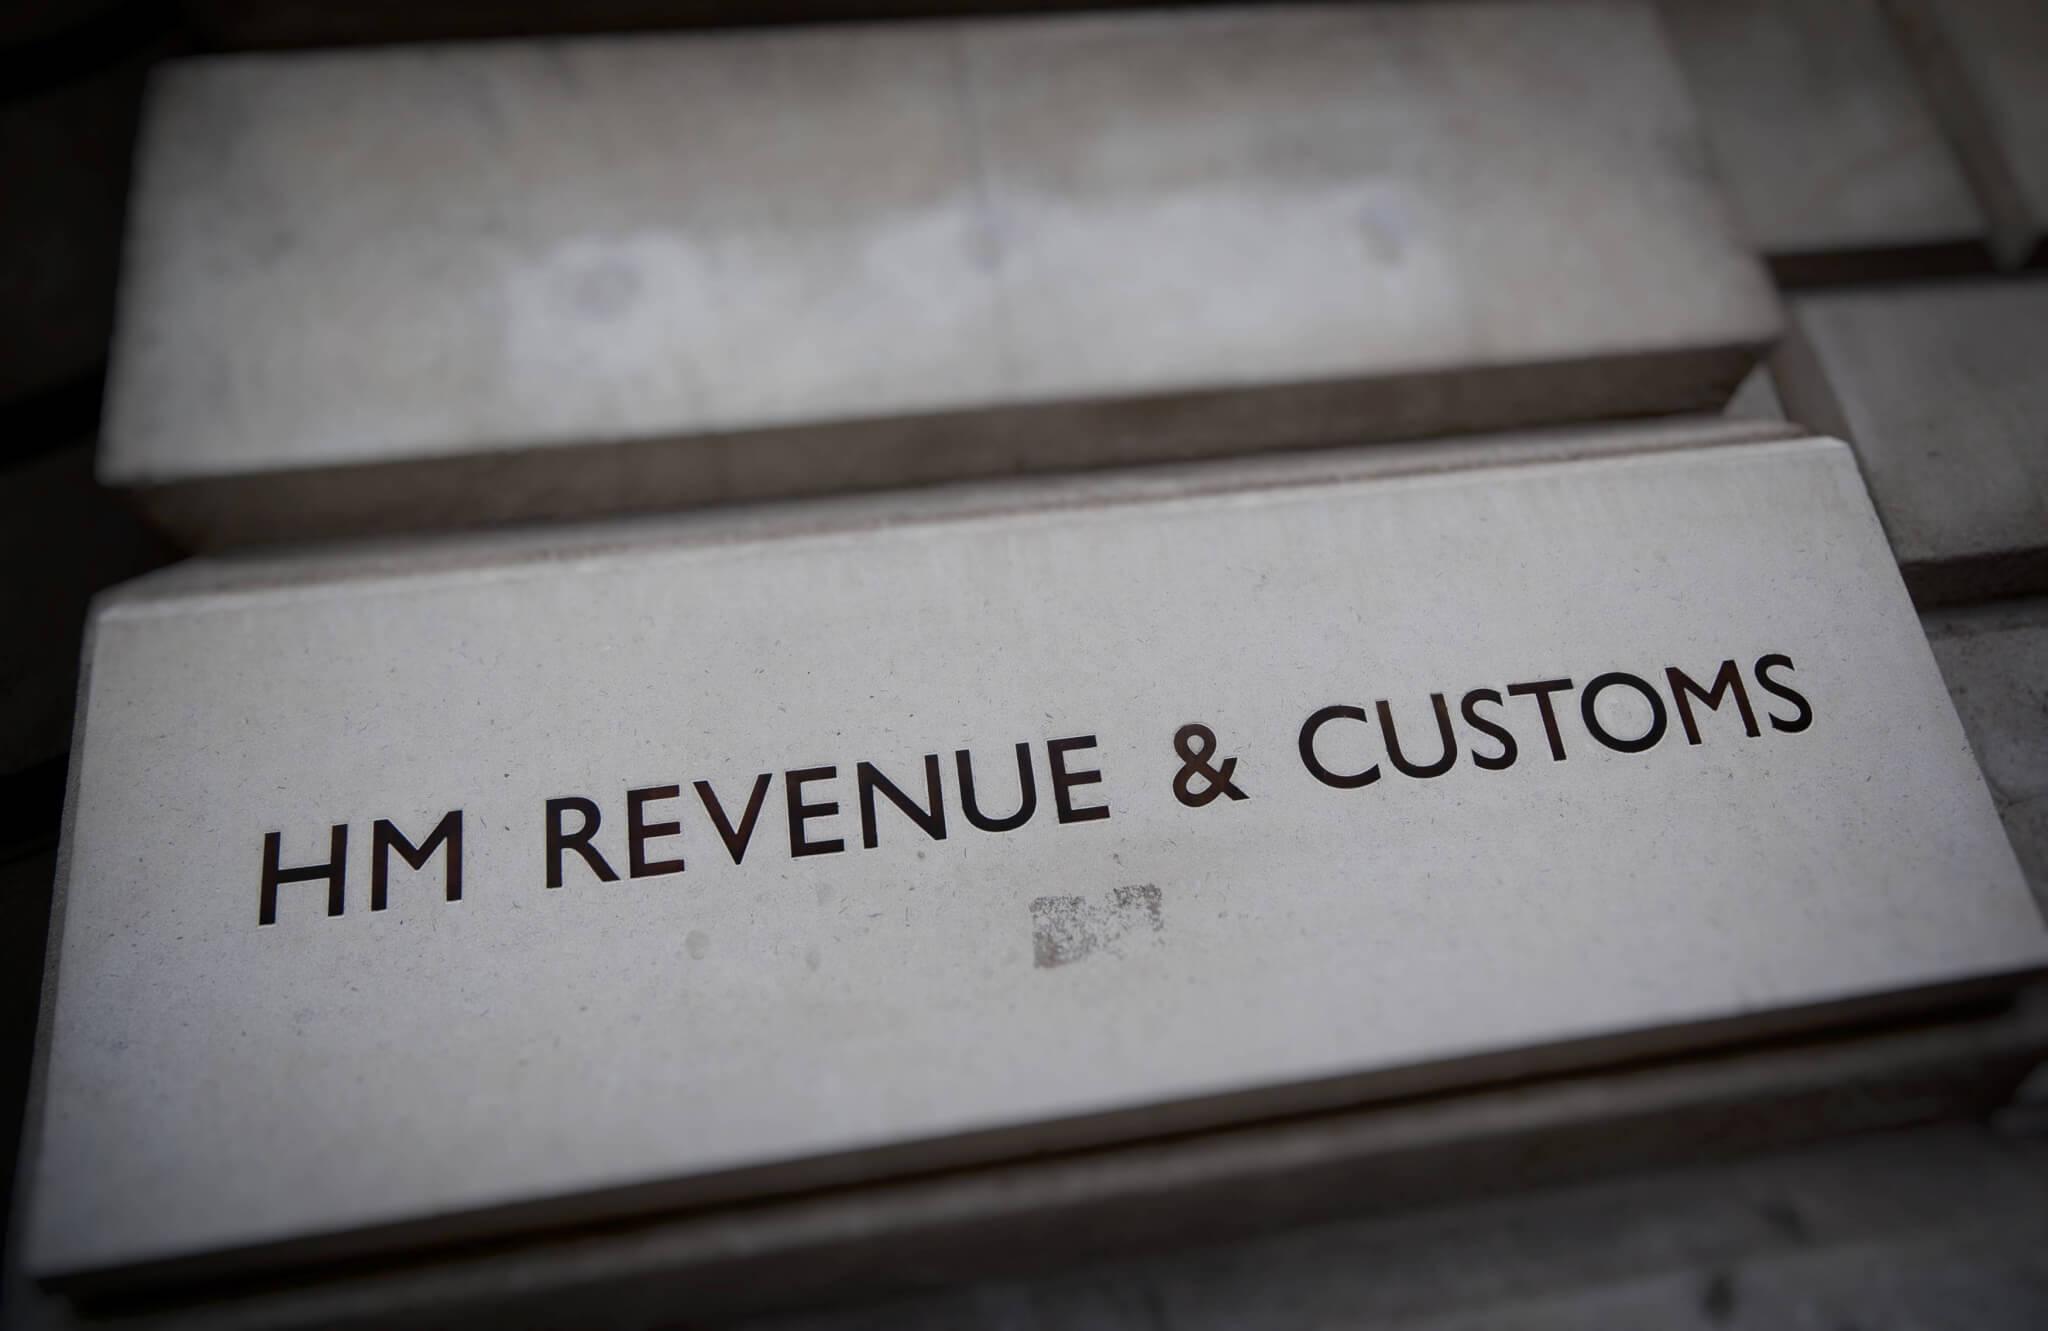 HMRC - Robinsons London Accountants